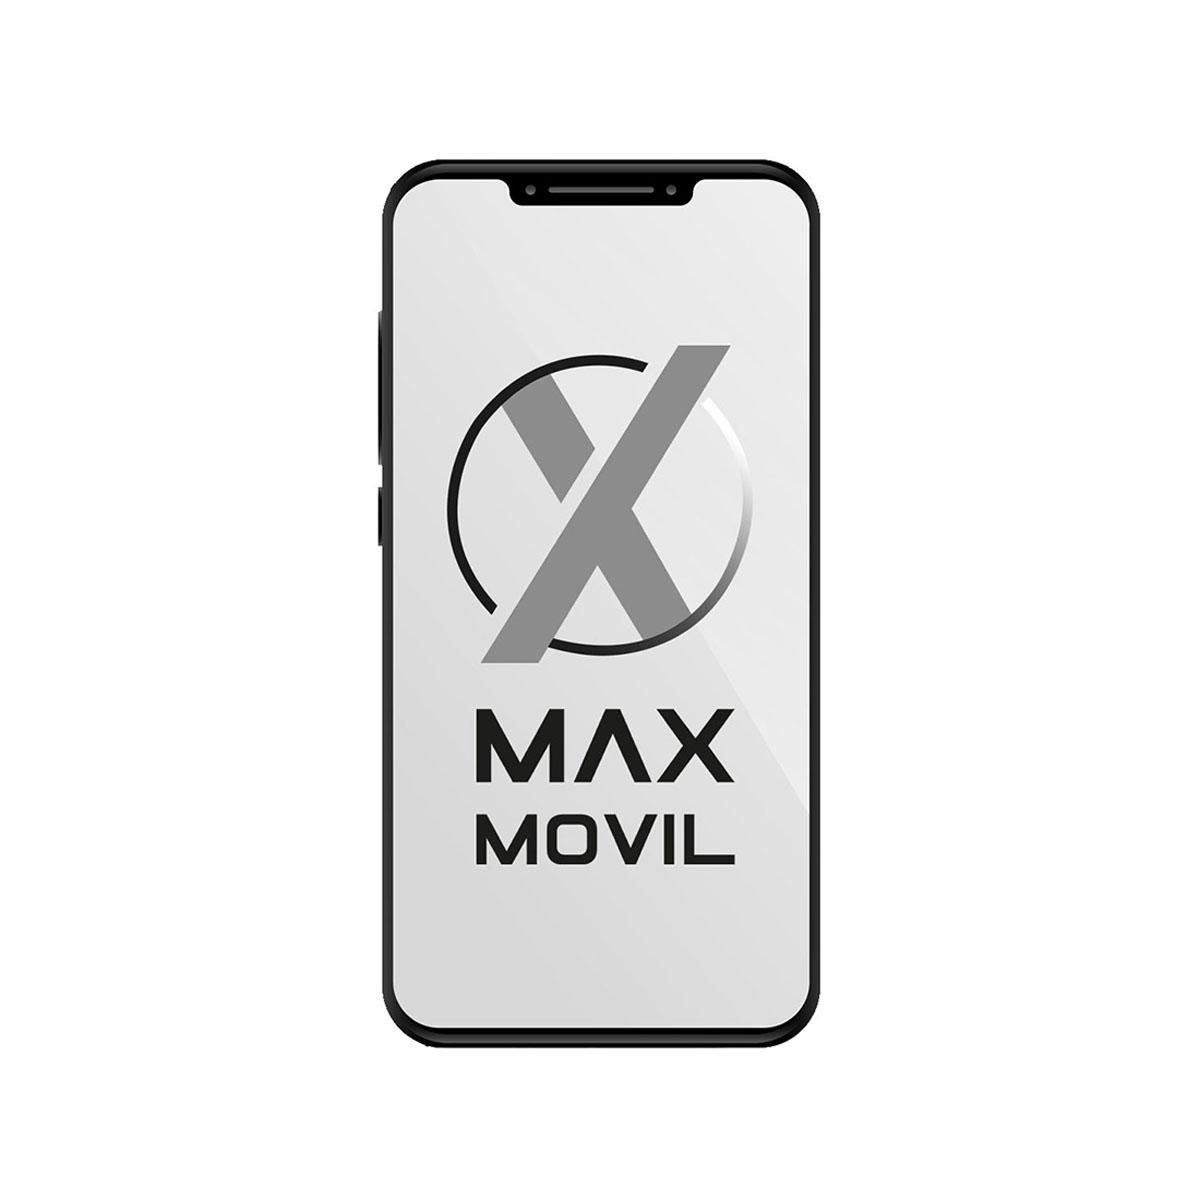 Apple iPhone XR Reacondicionado 64GB Blanco (White)